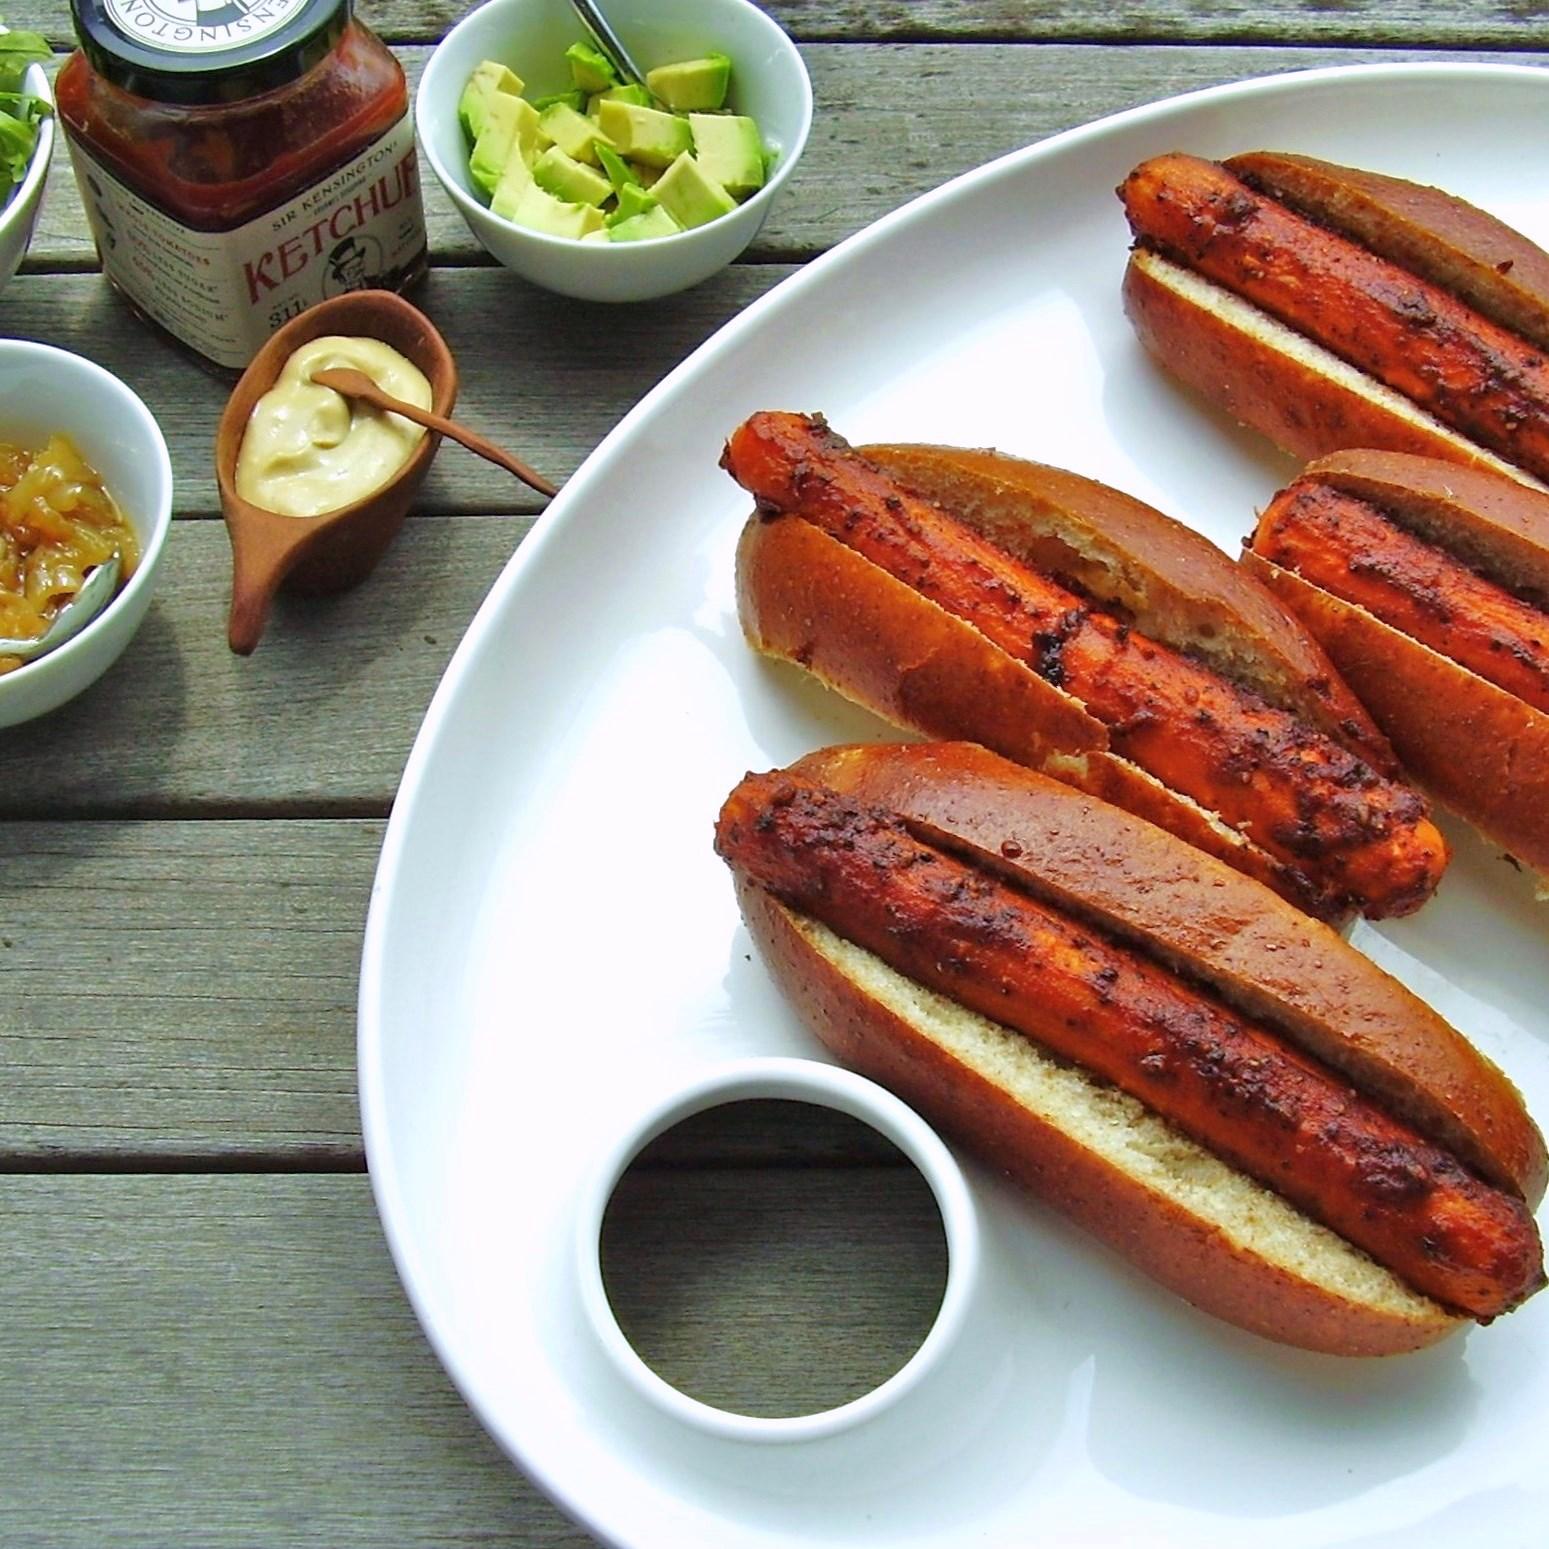 roasted vegan carrot hot dogs